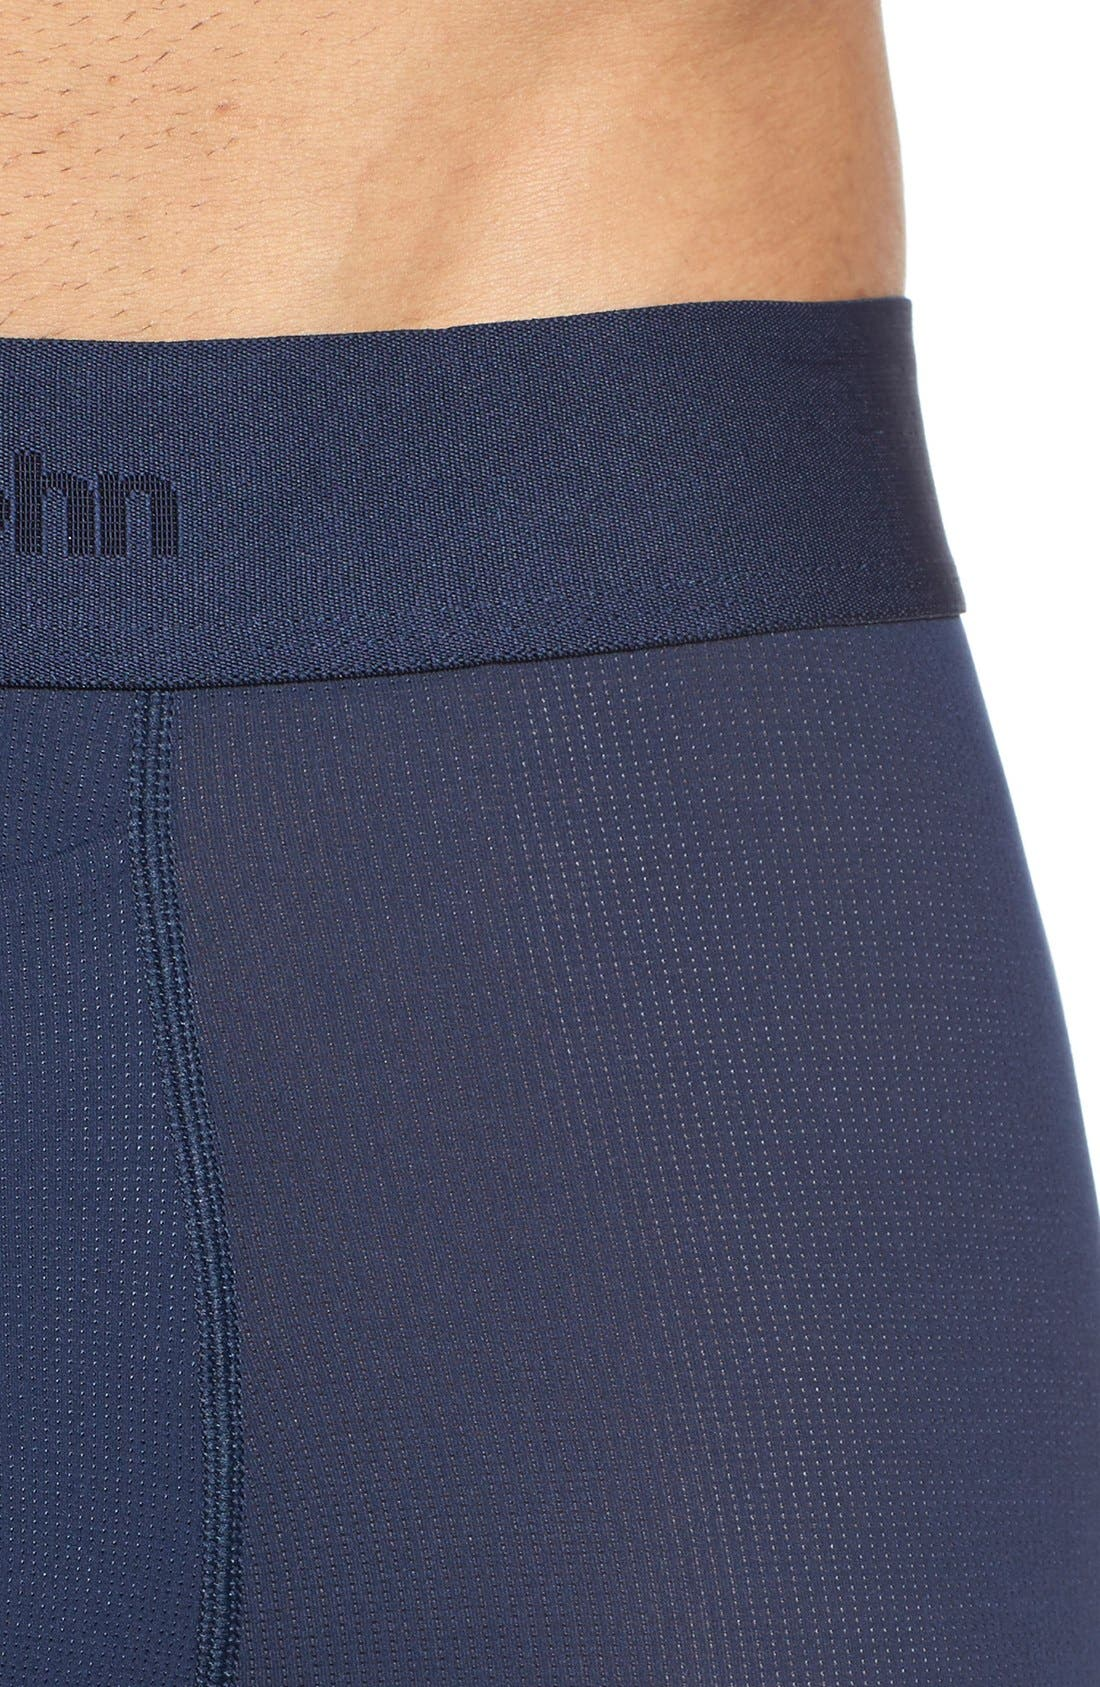 TOMMY JOHN, Air Trunks, Alternate thumbnail 4, color, DRESS BLUES